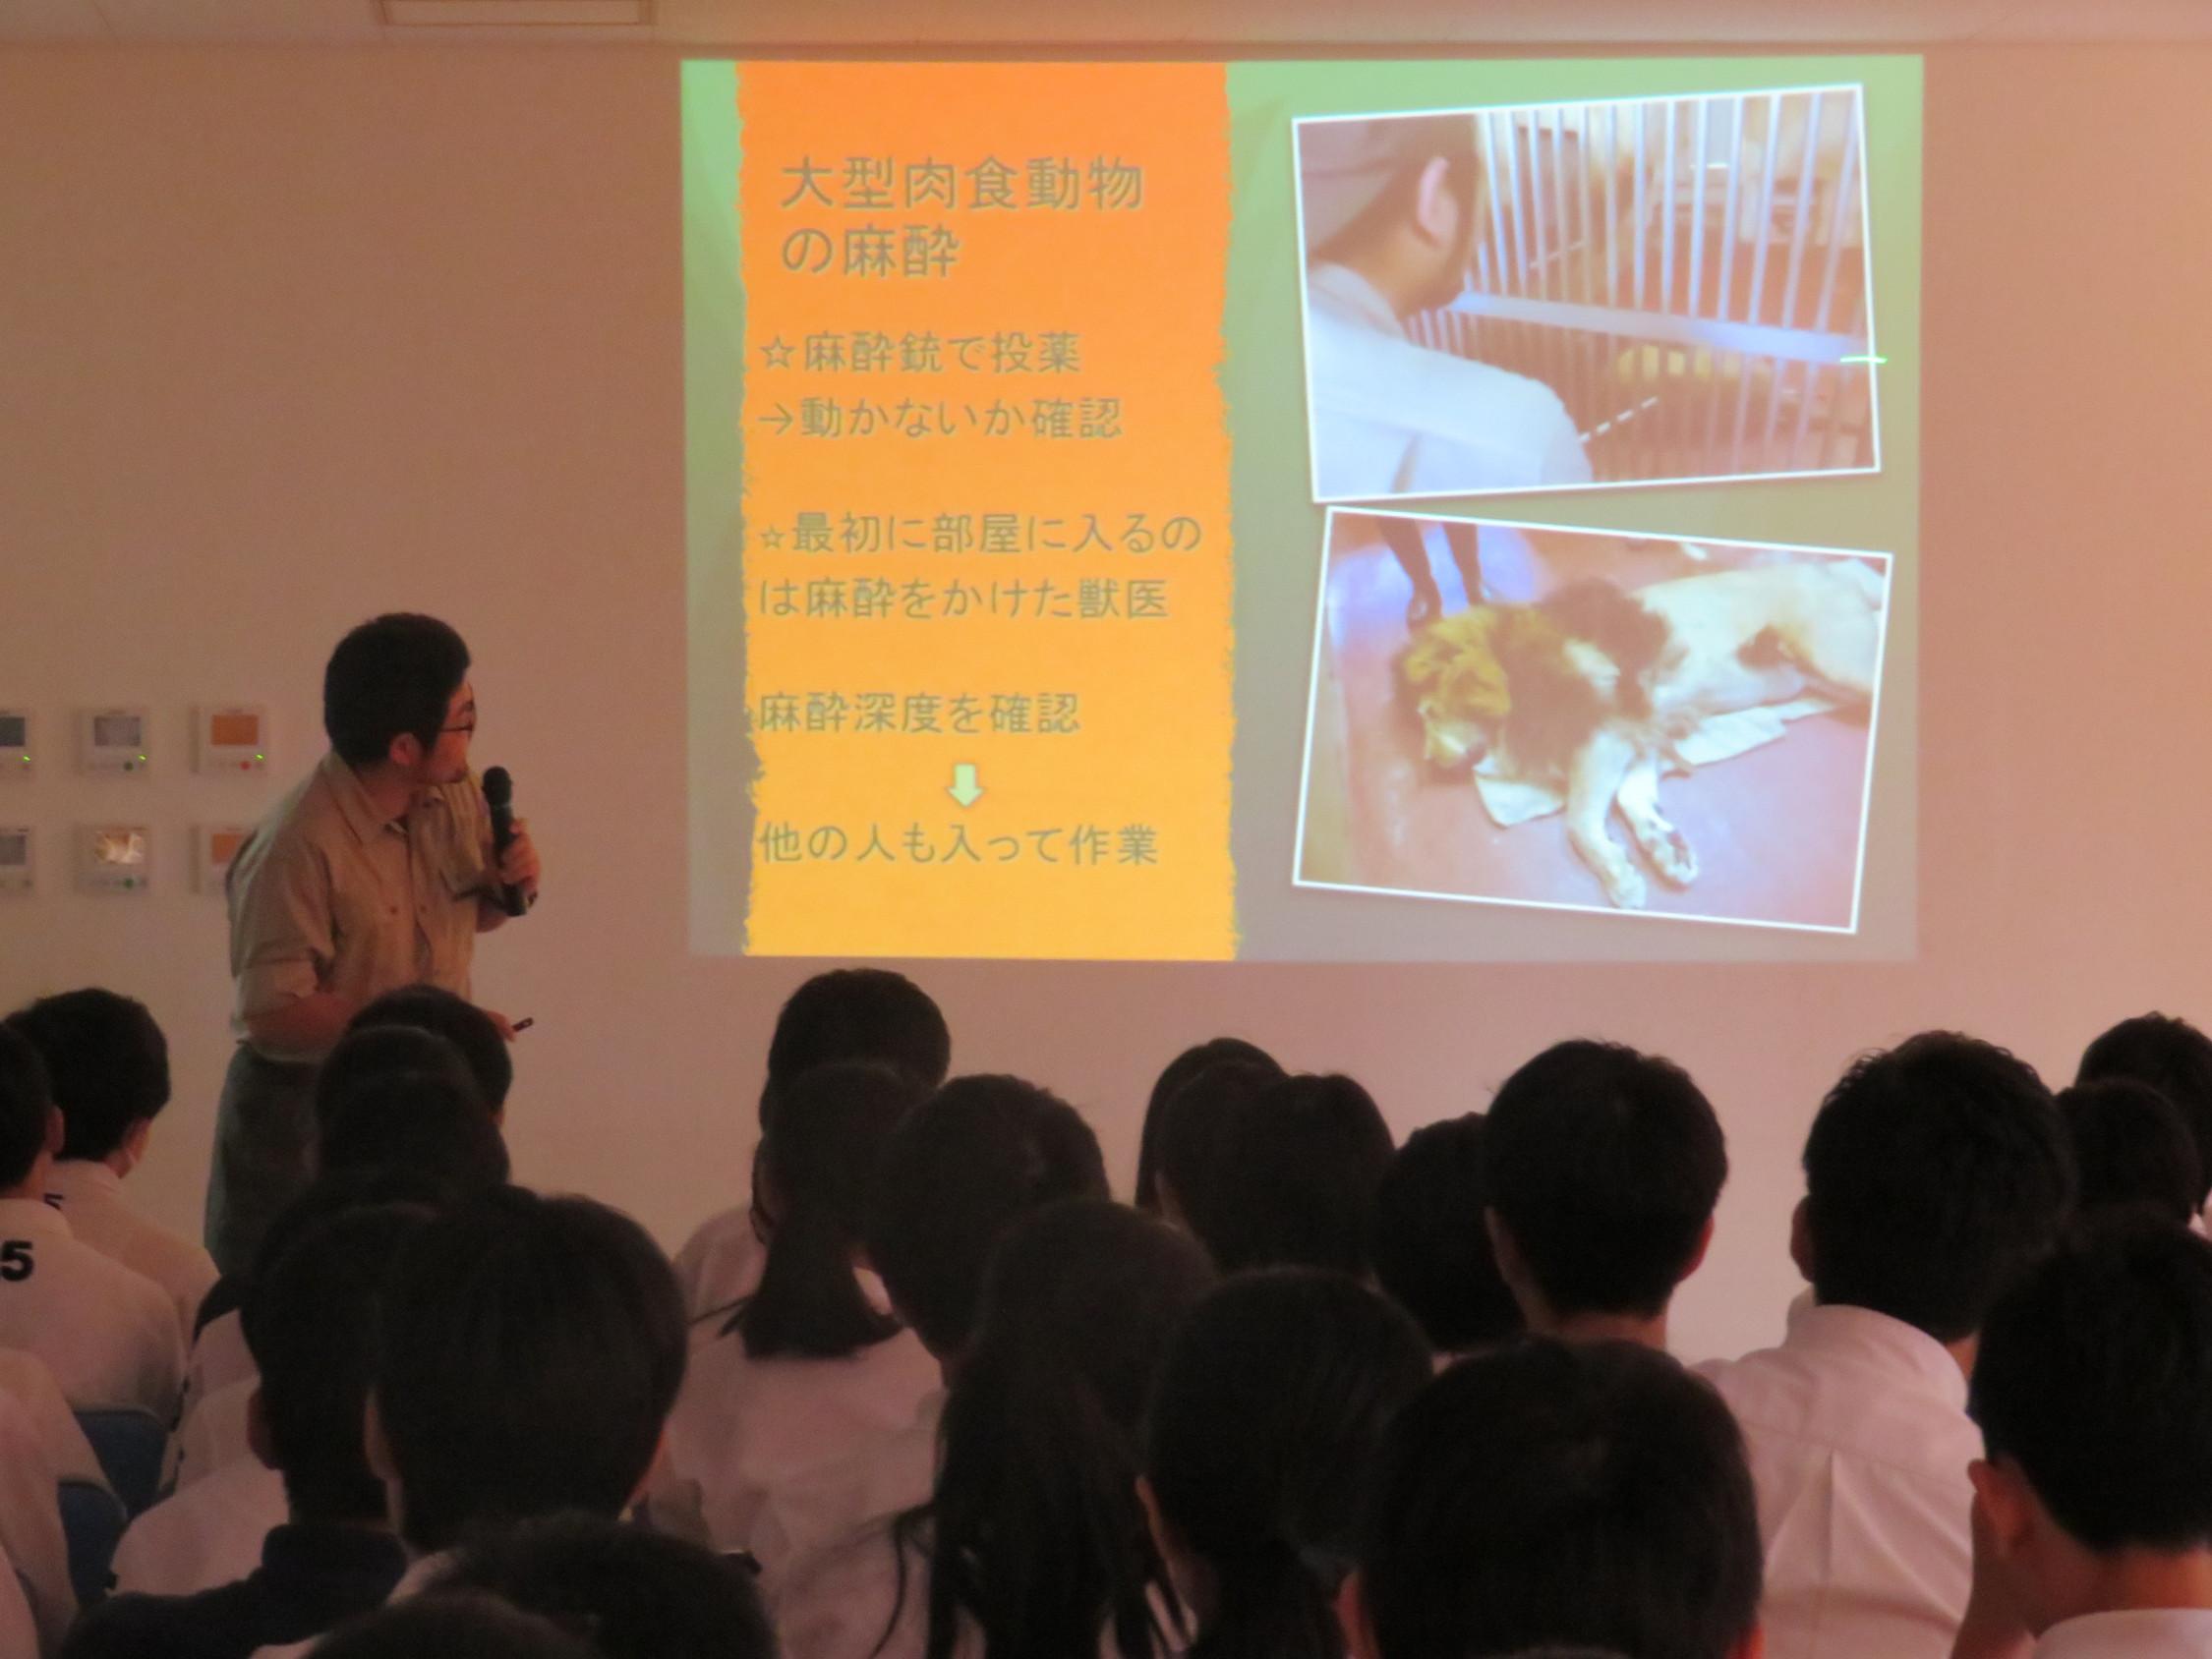 G8 安佐動物公園 獣医師 お仕事講座